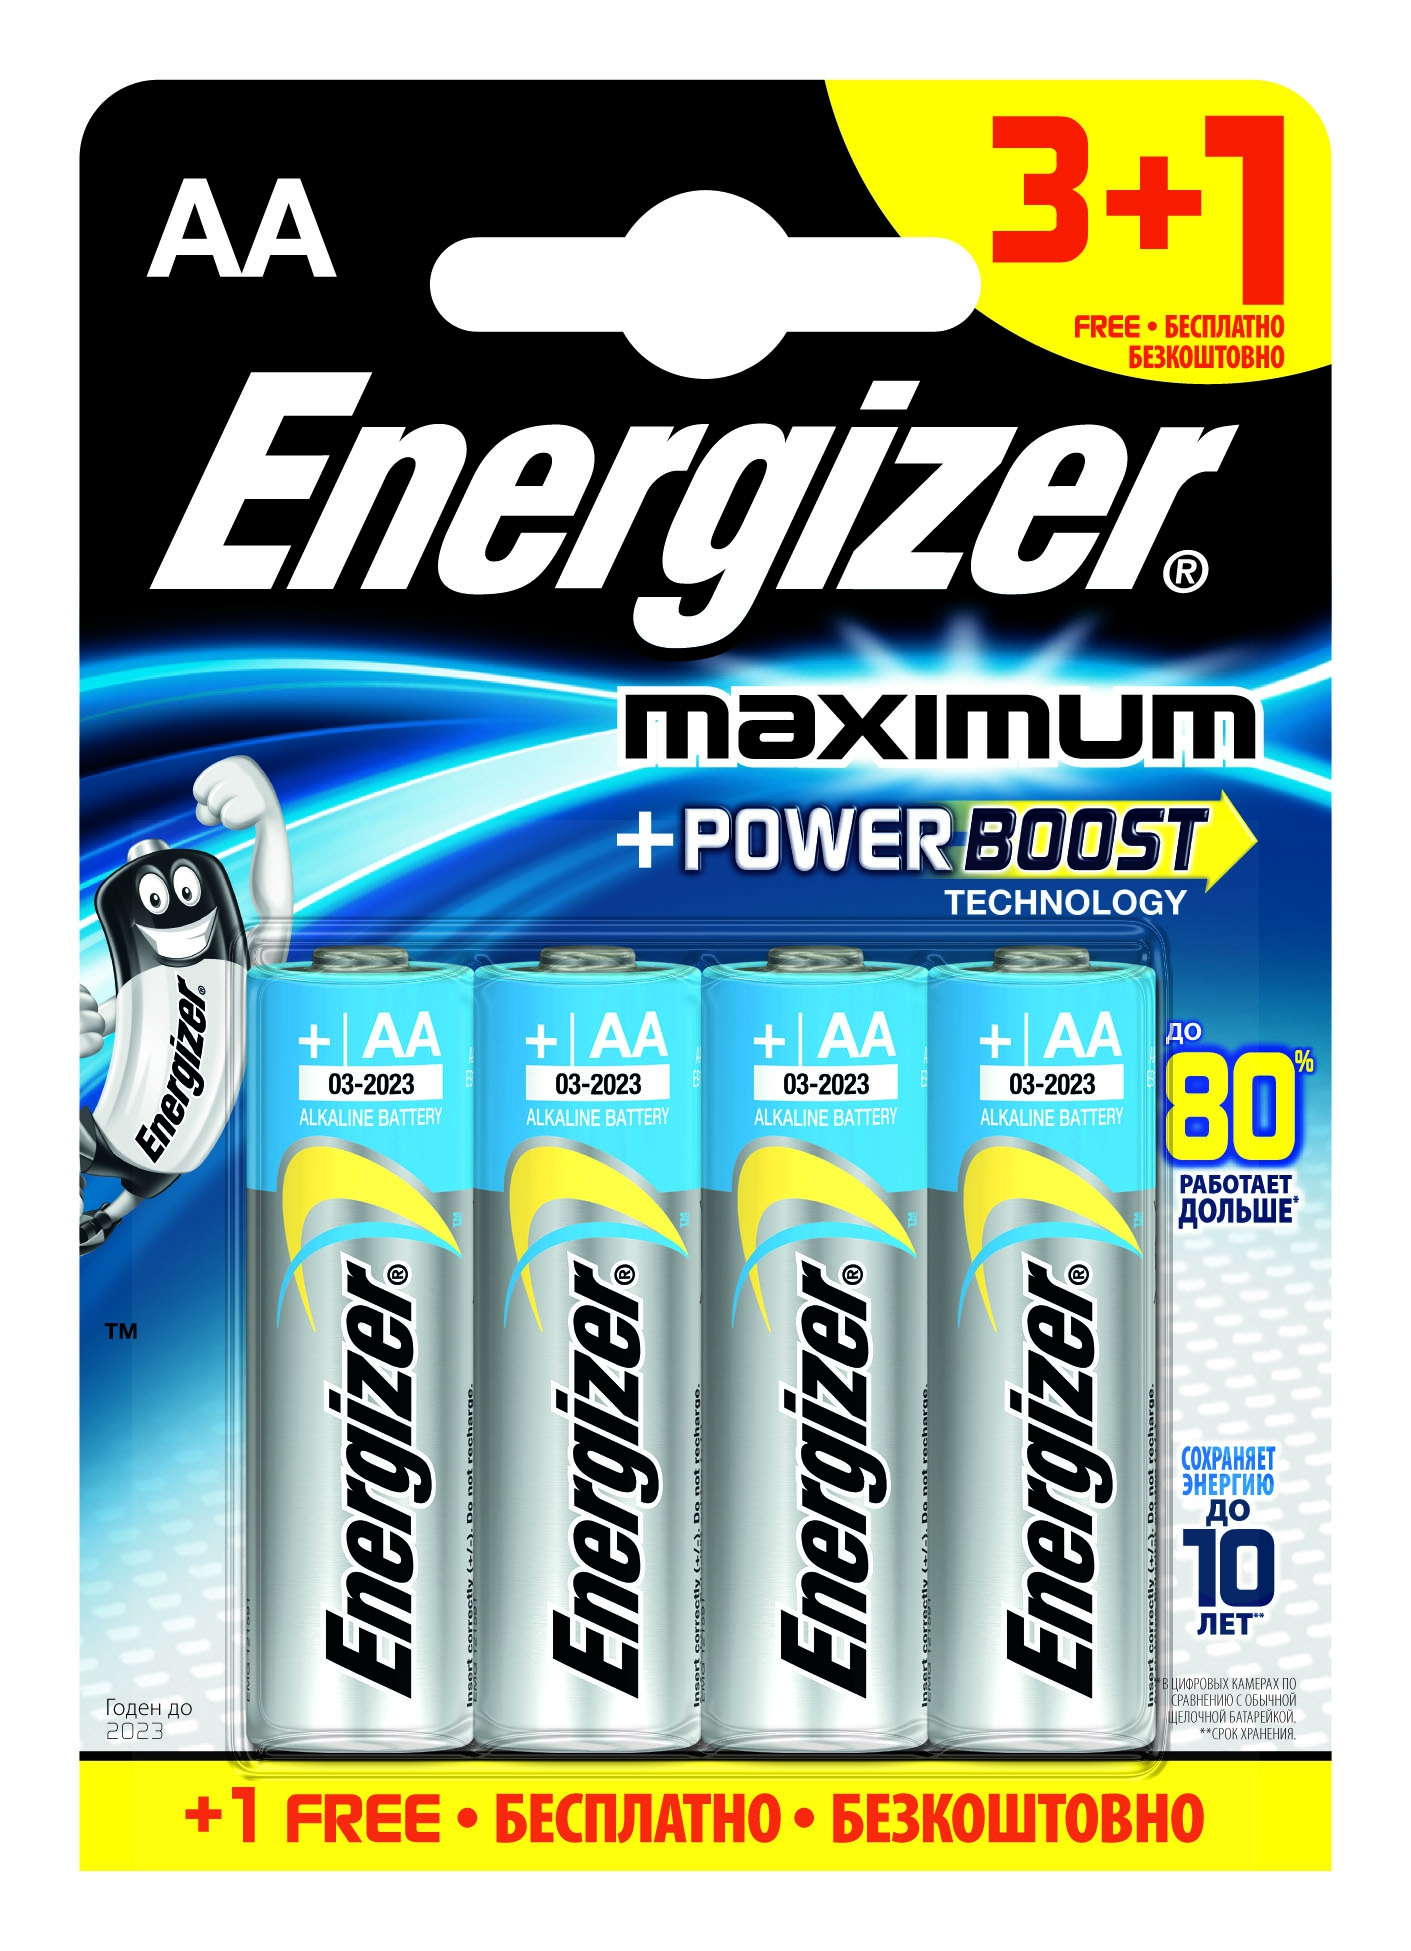 Элементы питания Energizer Energizer Maximum AA Промо 4 шт батарейки energizer alkaline power аа 6 шт